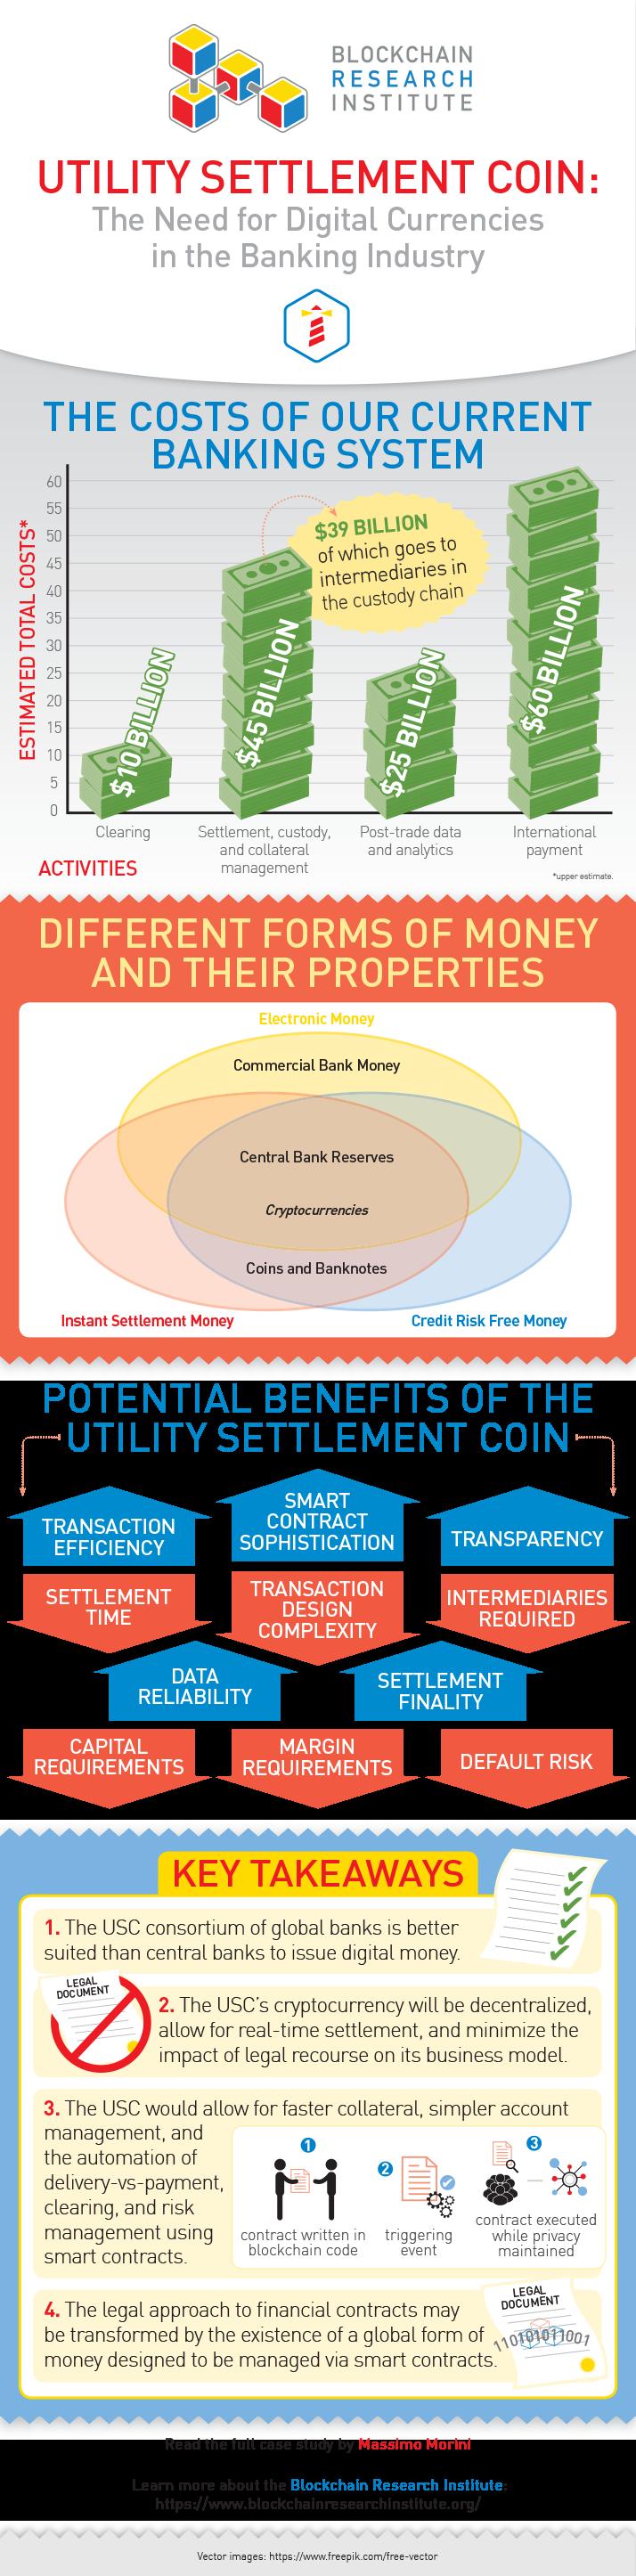 BRI-UtilitySettlementCoin-INF.png